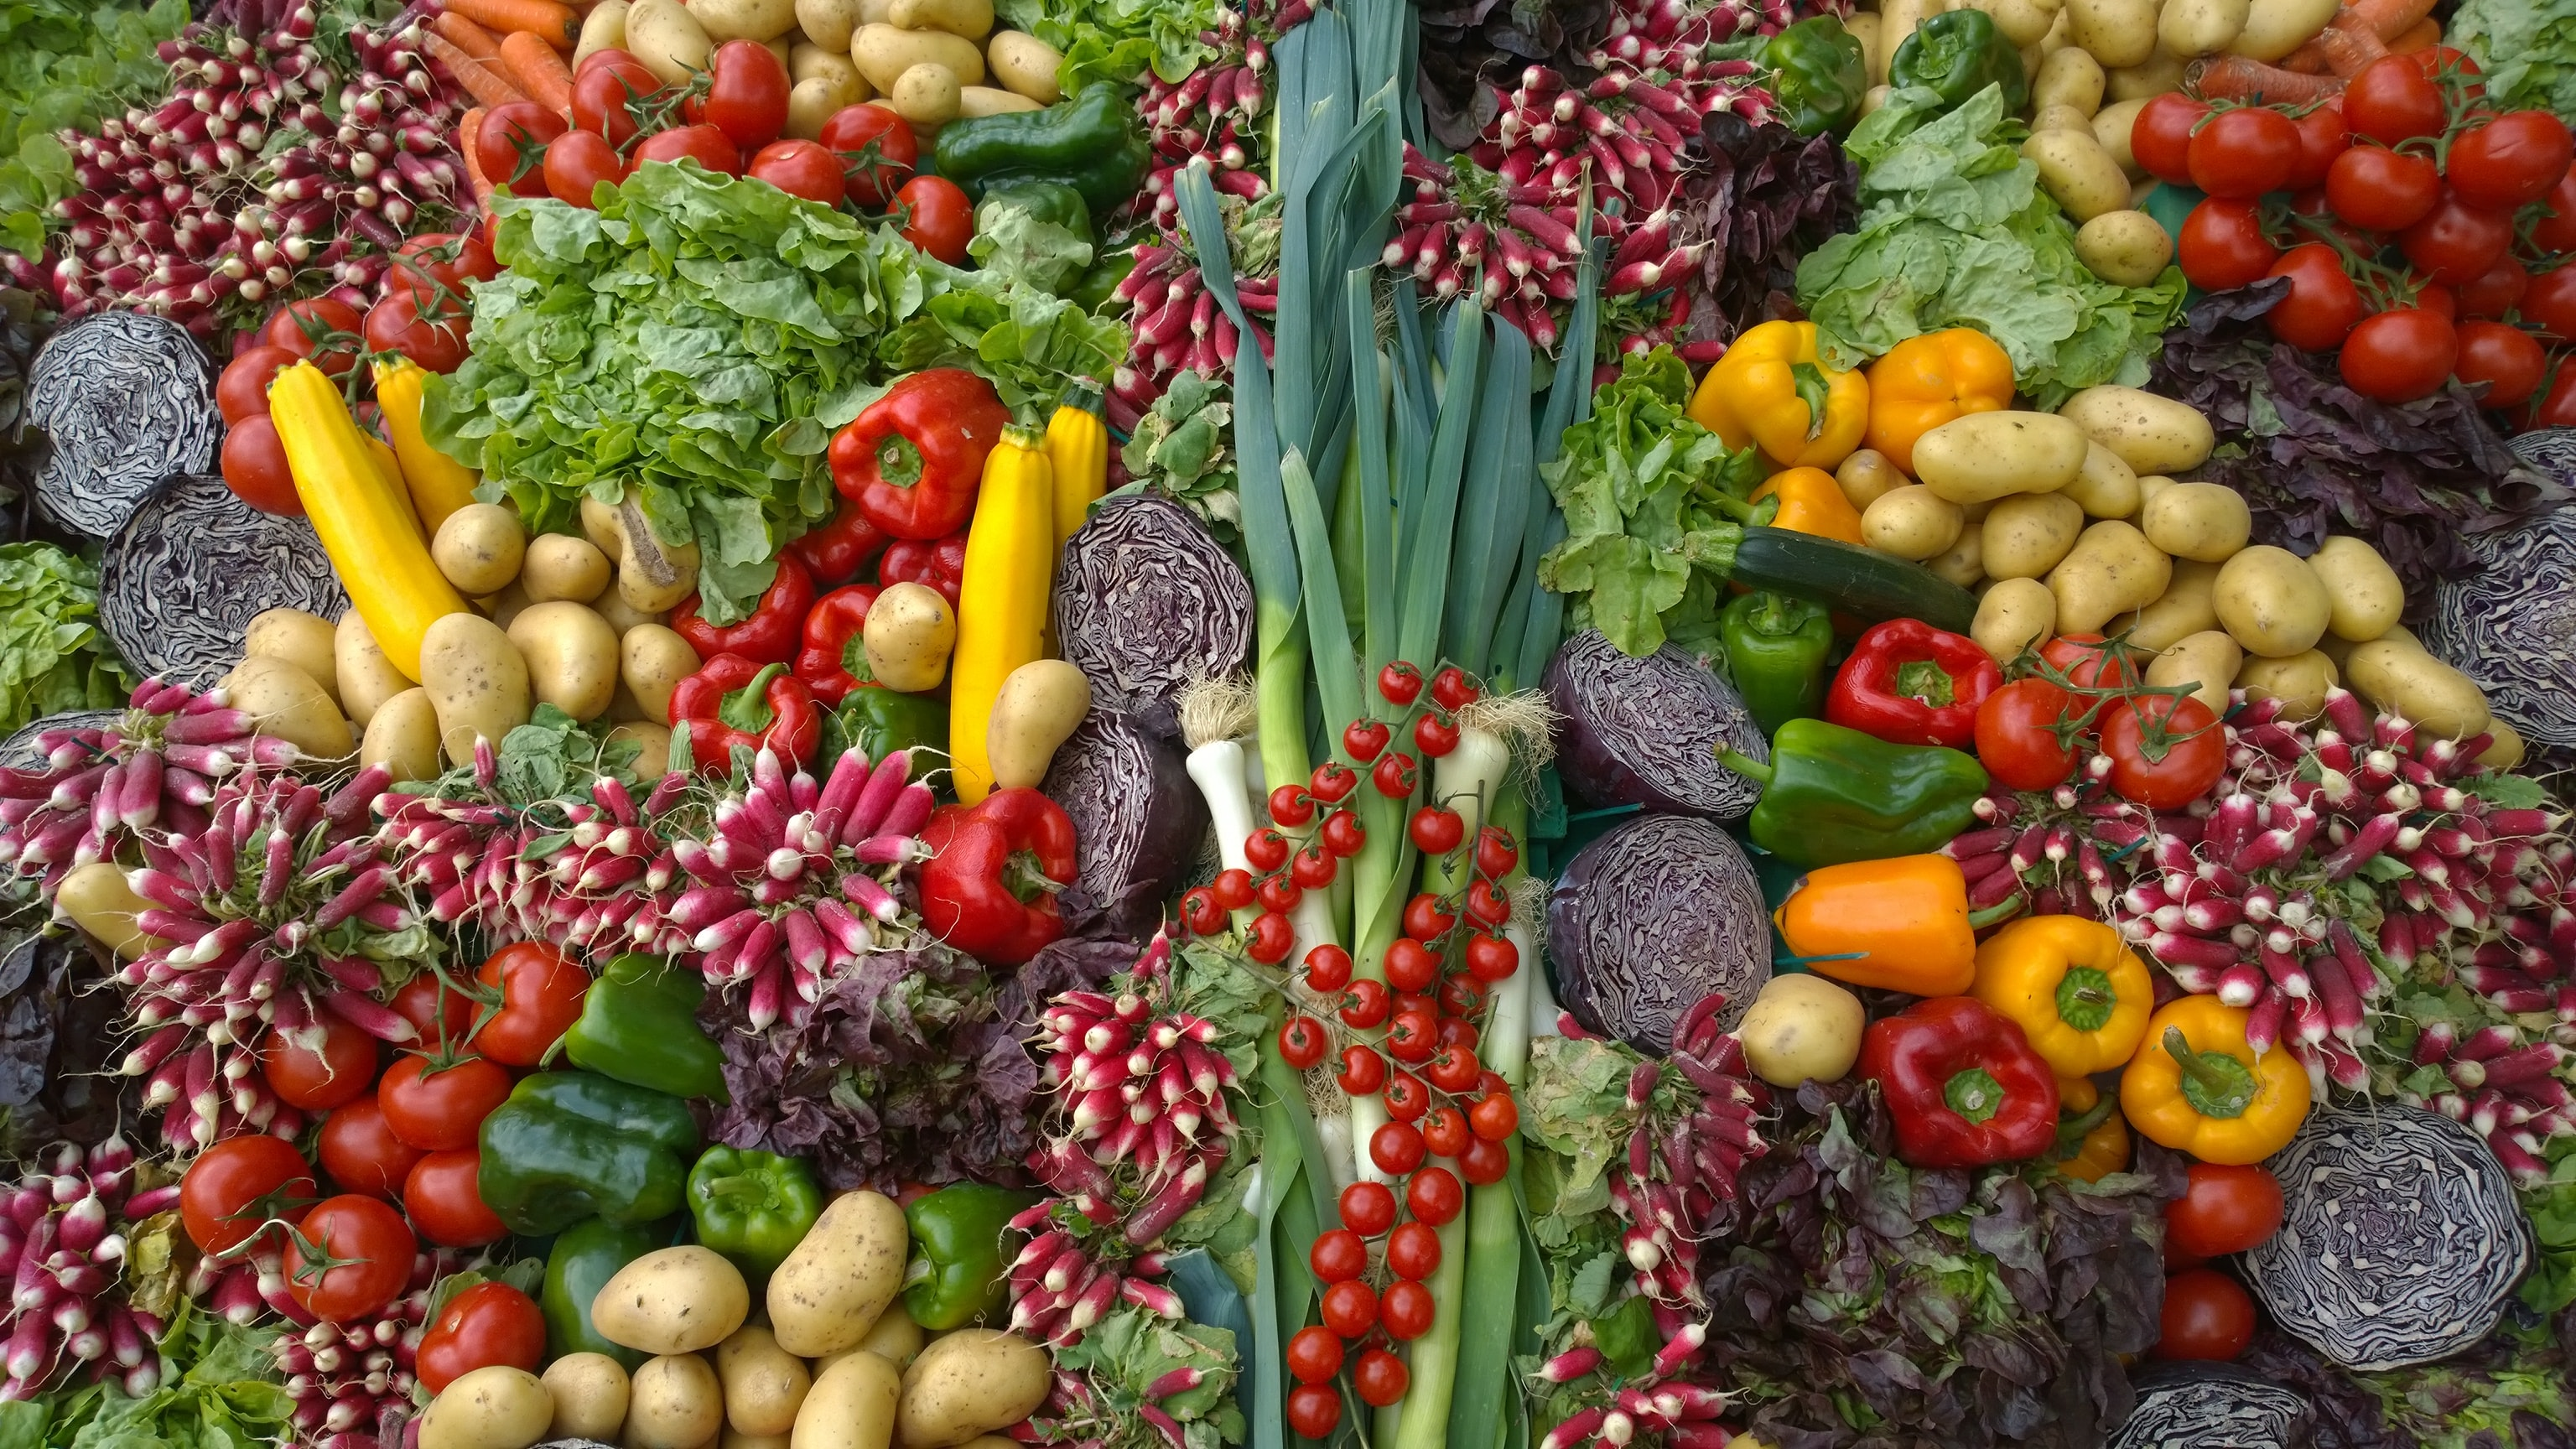 Beautiful array of local produce